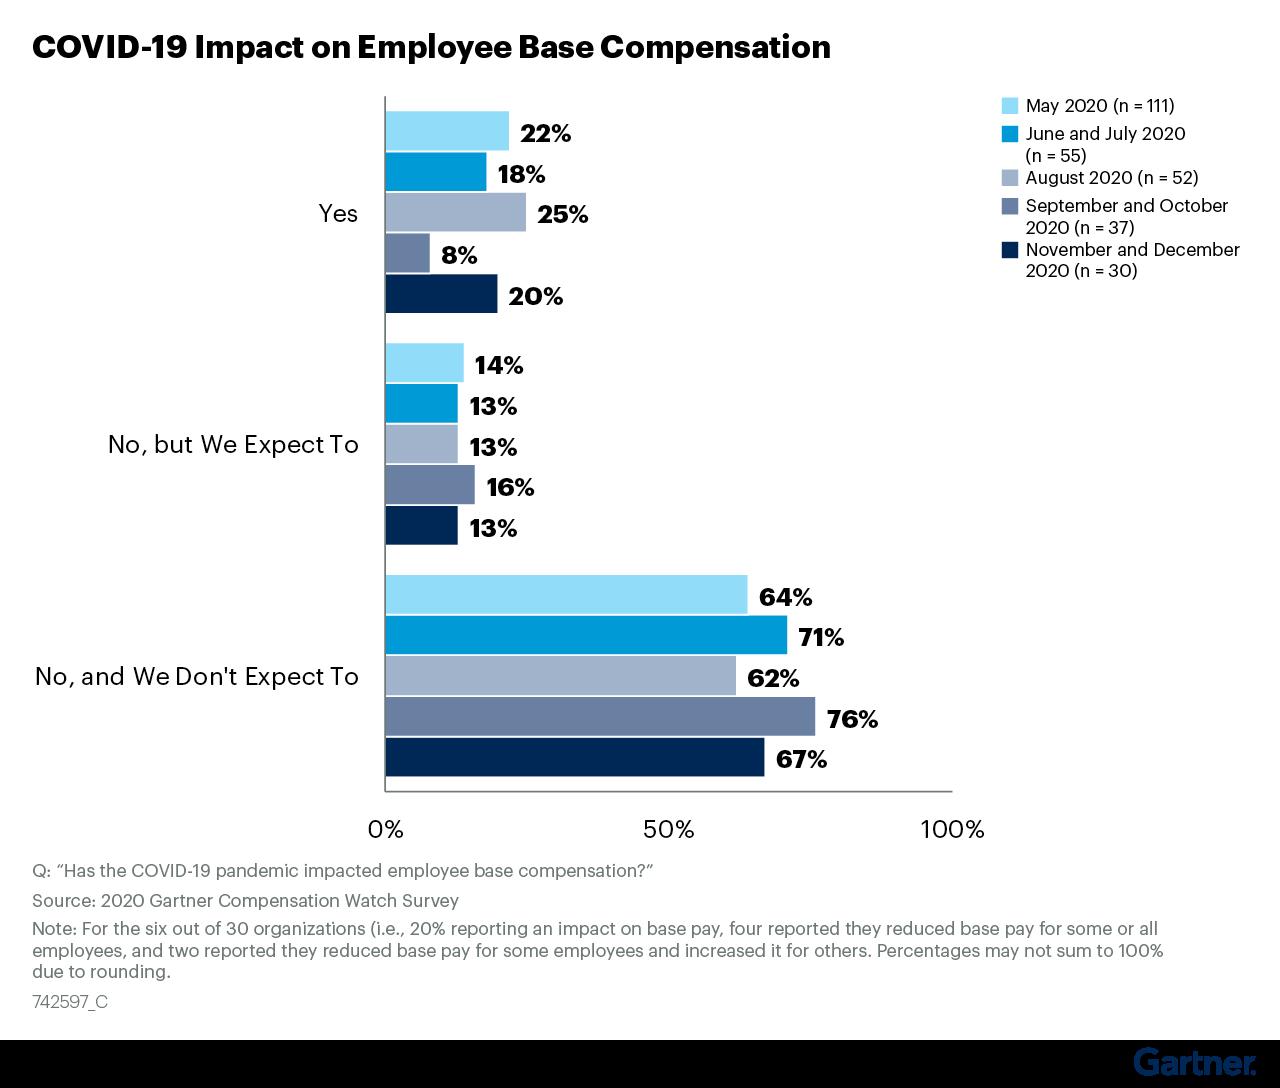 Figure 15: COVID-19 Impact on Employee Base Compensation